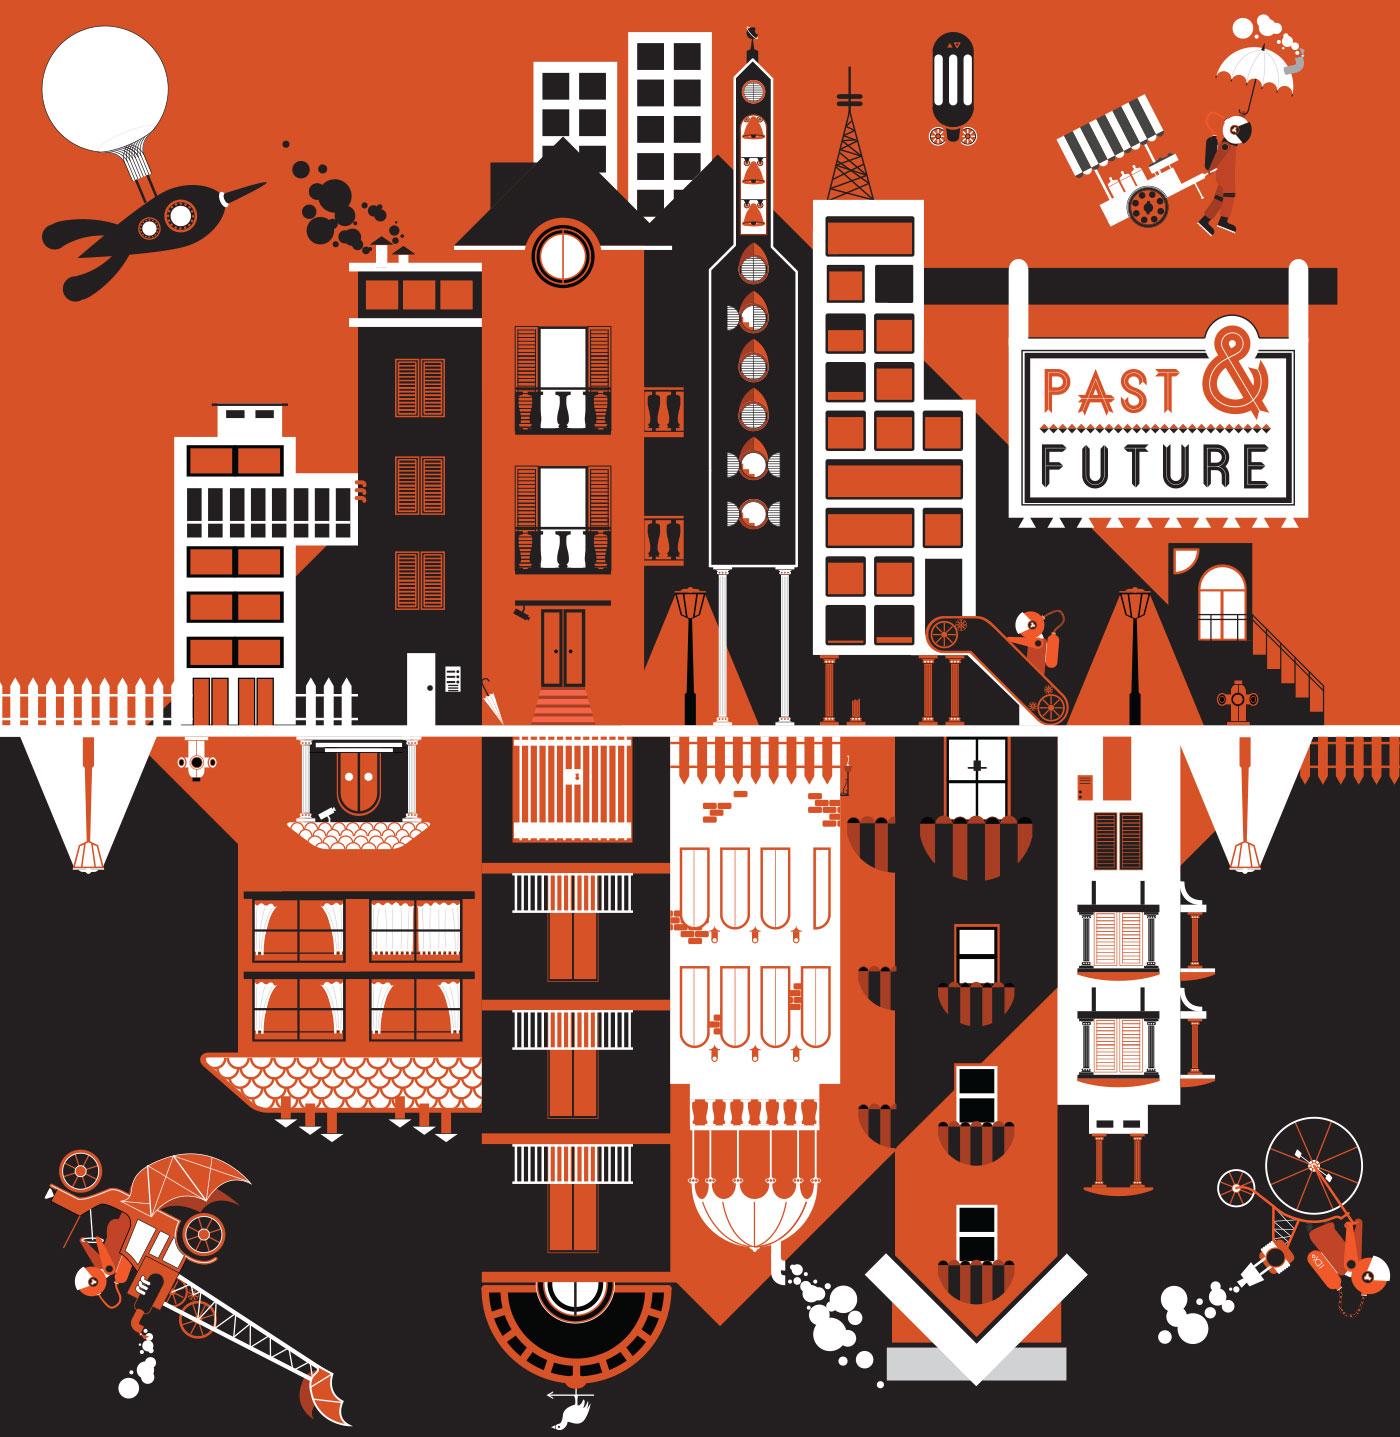 5 past future grafico milano chaubet vectorial art